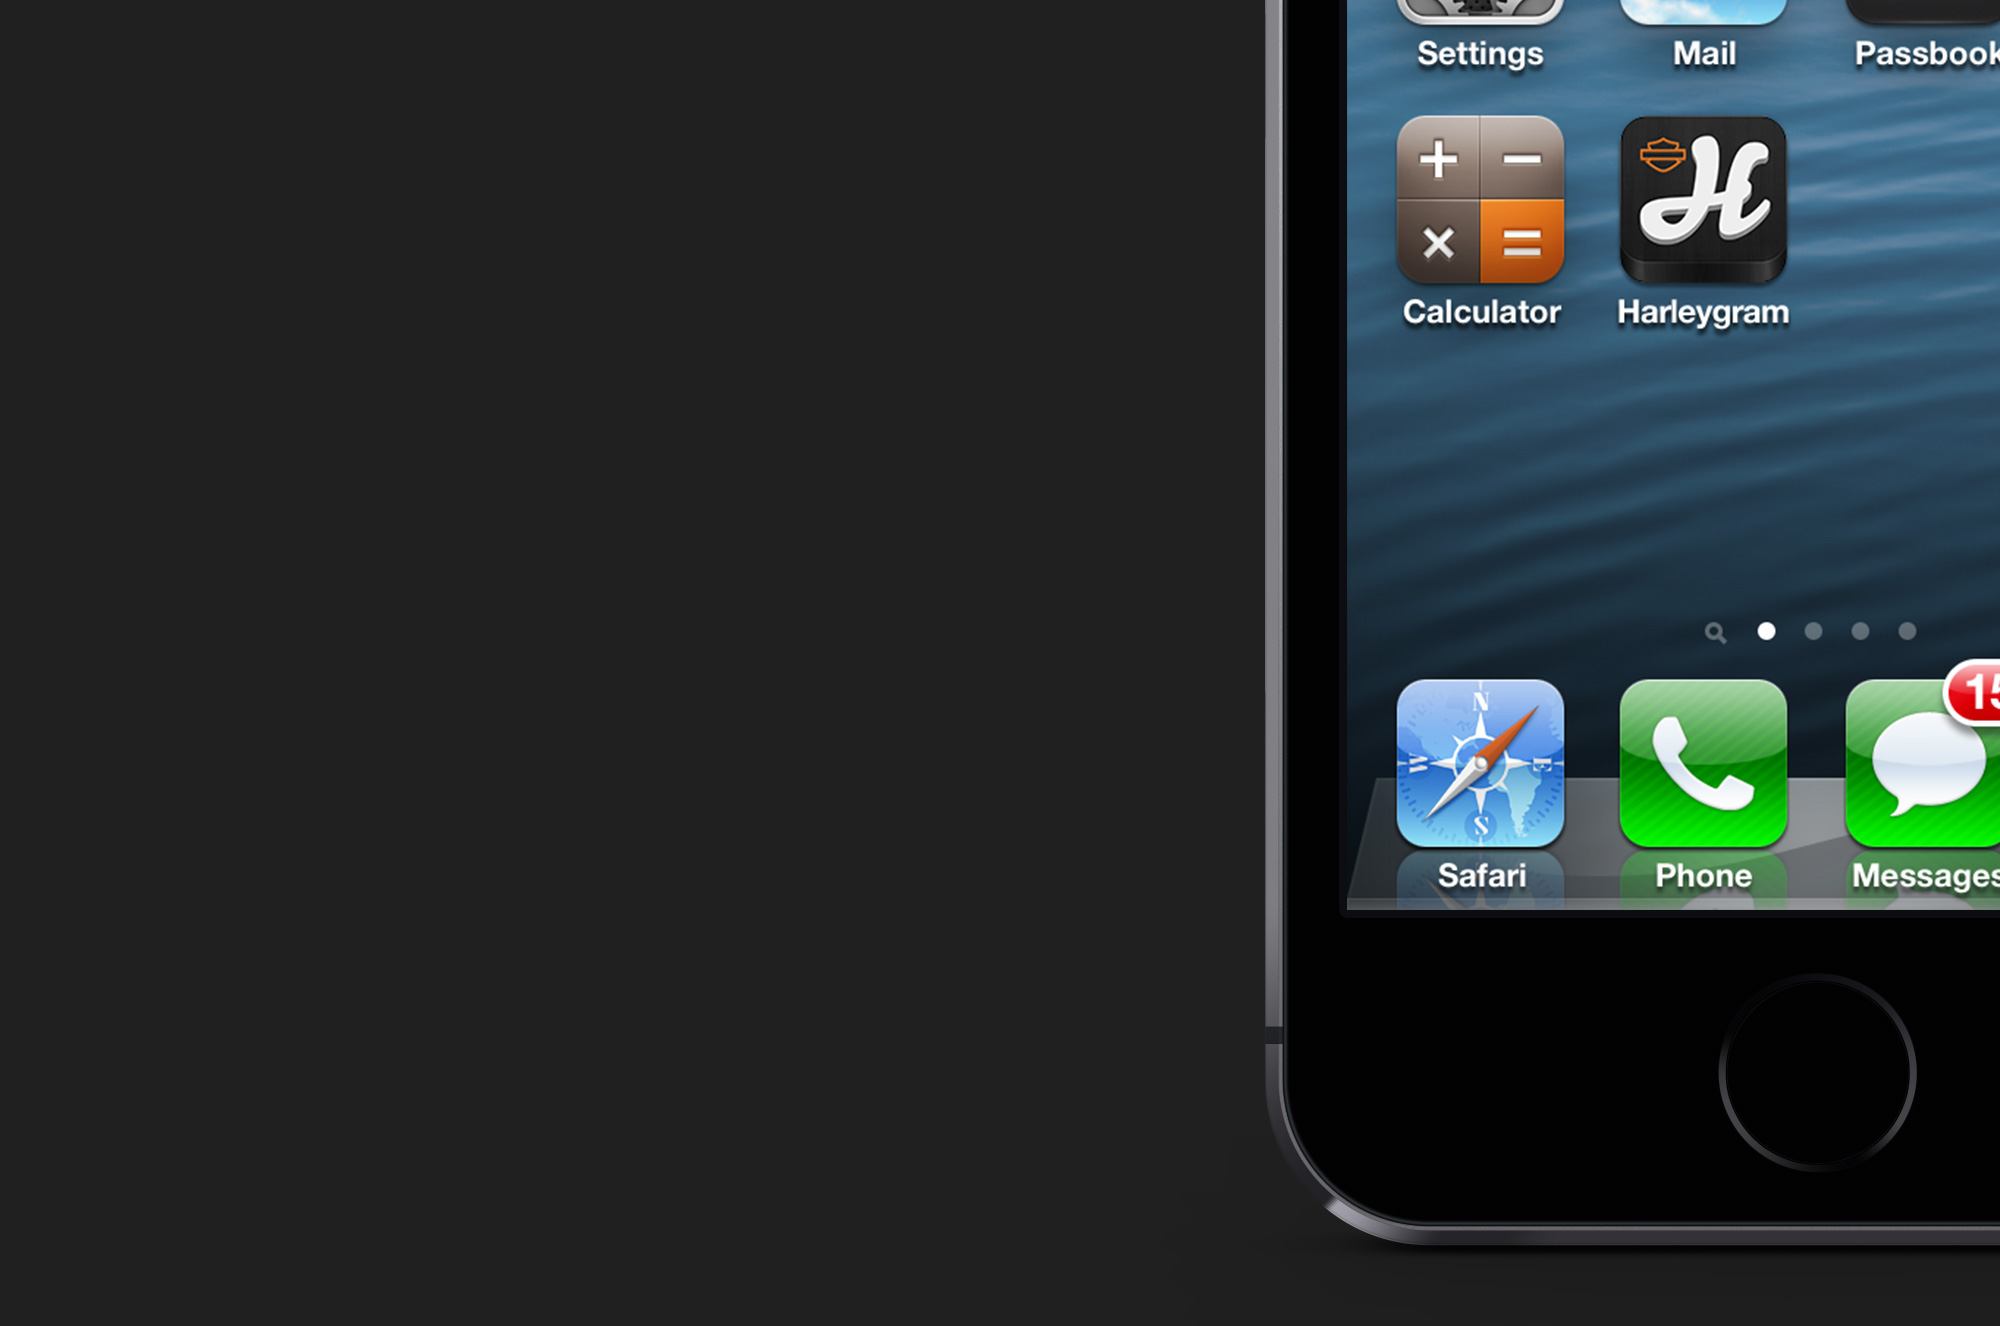 raniev-rod-alvarez-diseño-gráfico-queretaro-app-harley-davidson-harleygram-2